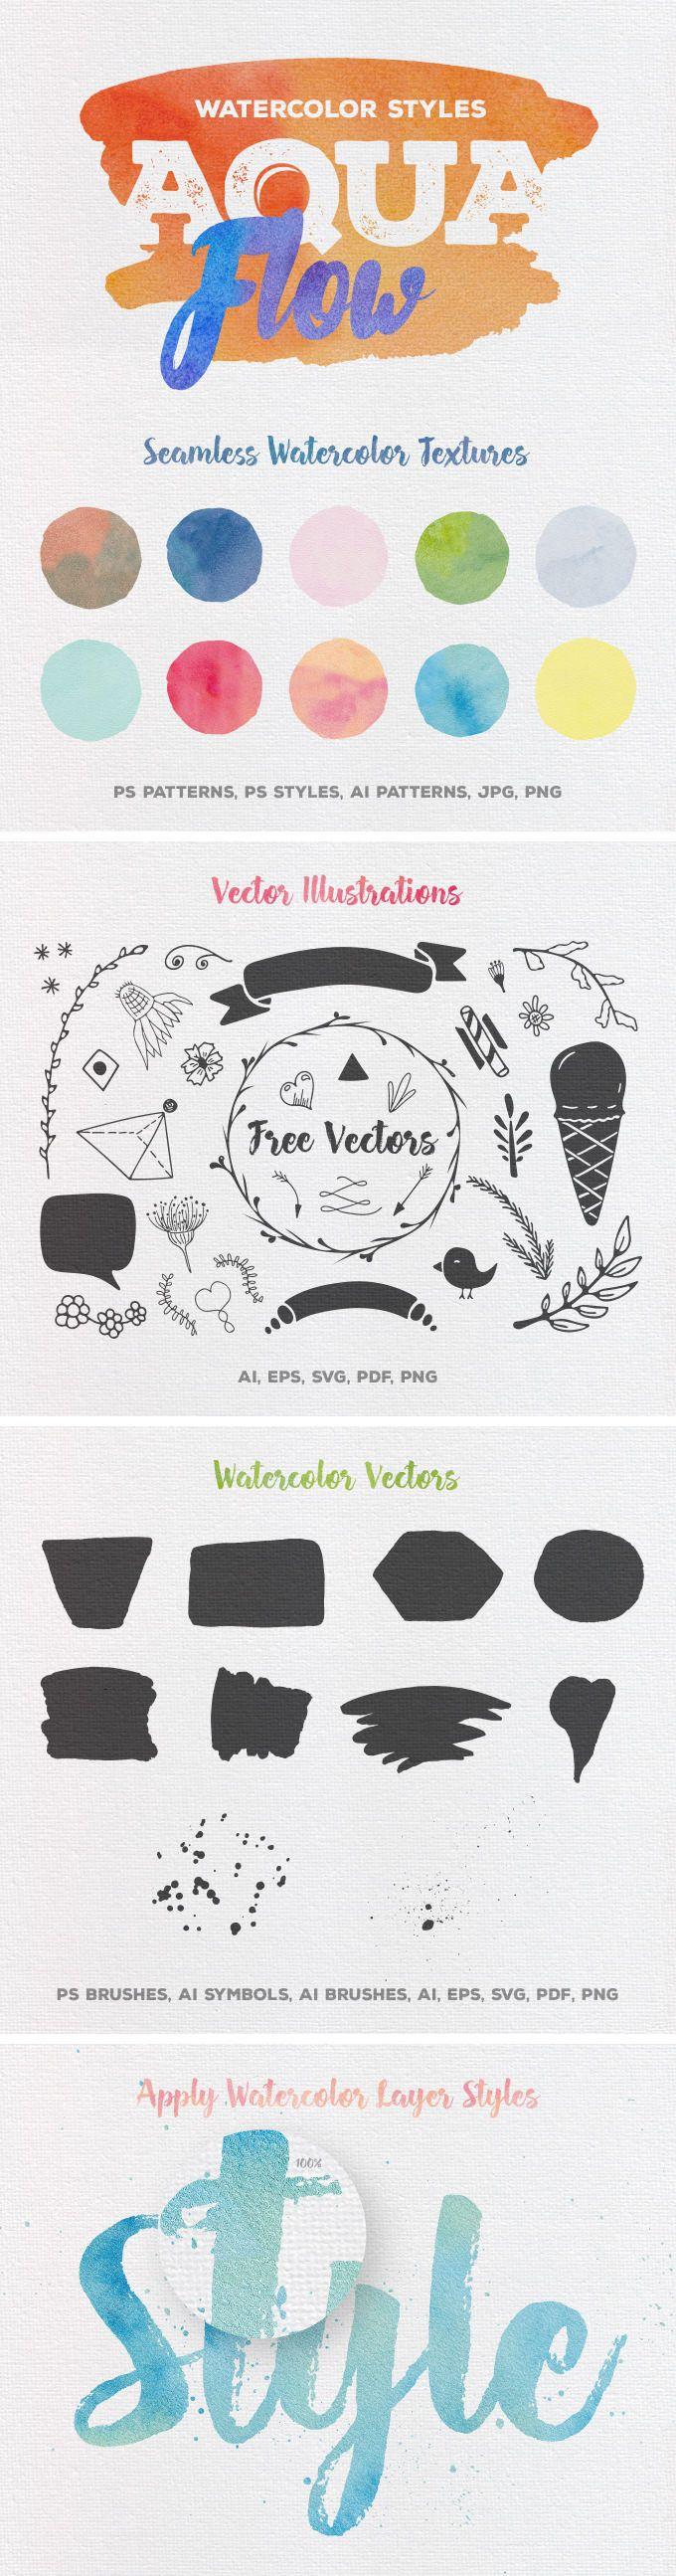 Aquaflow Watercolor Styles - download freebie by PixelBuddha